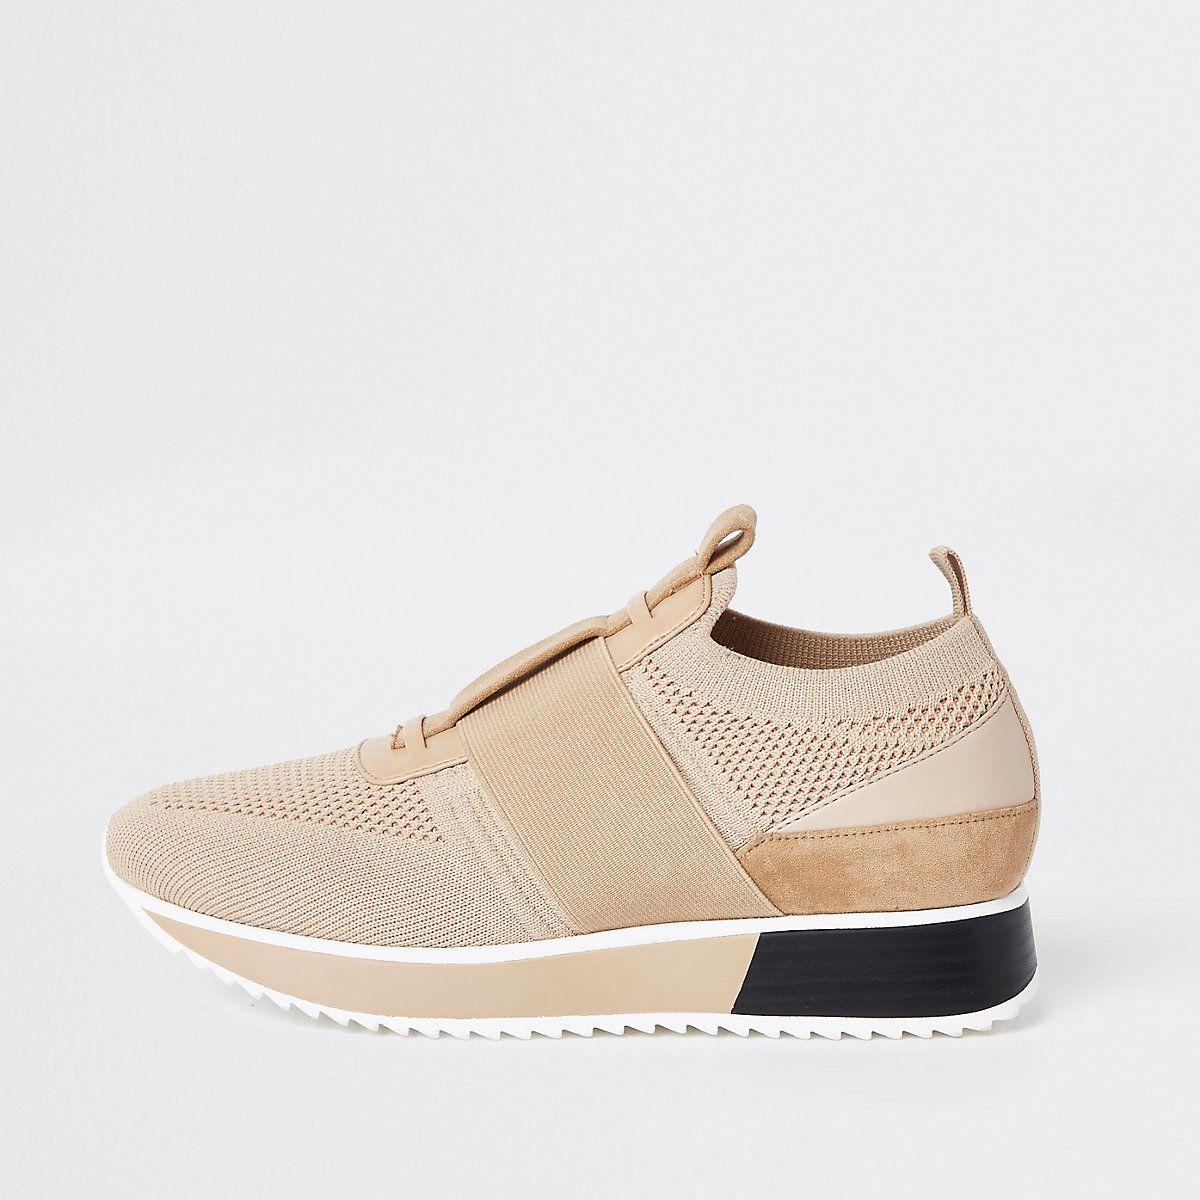 Beige knitted elastic runner shoes